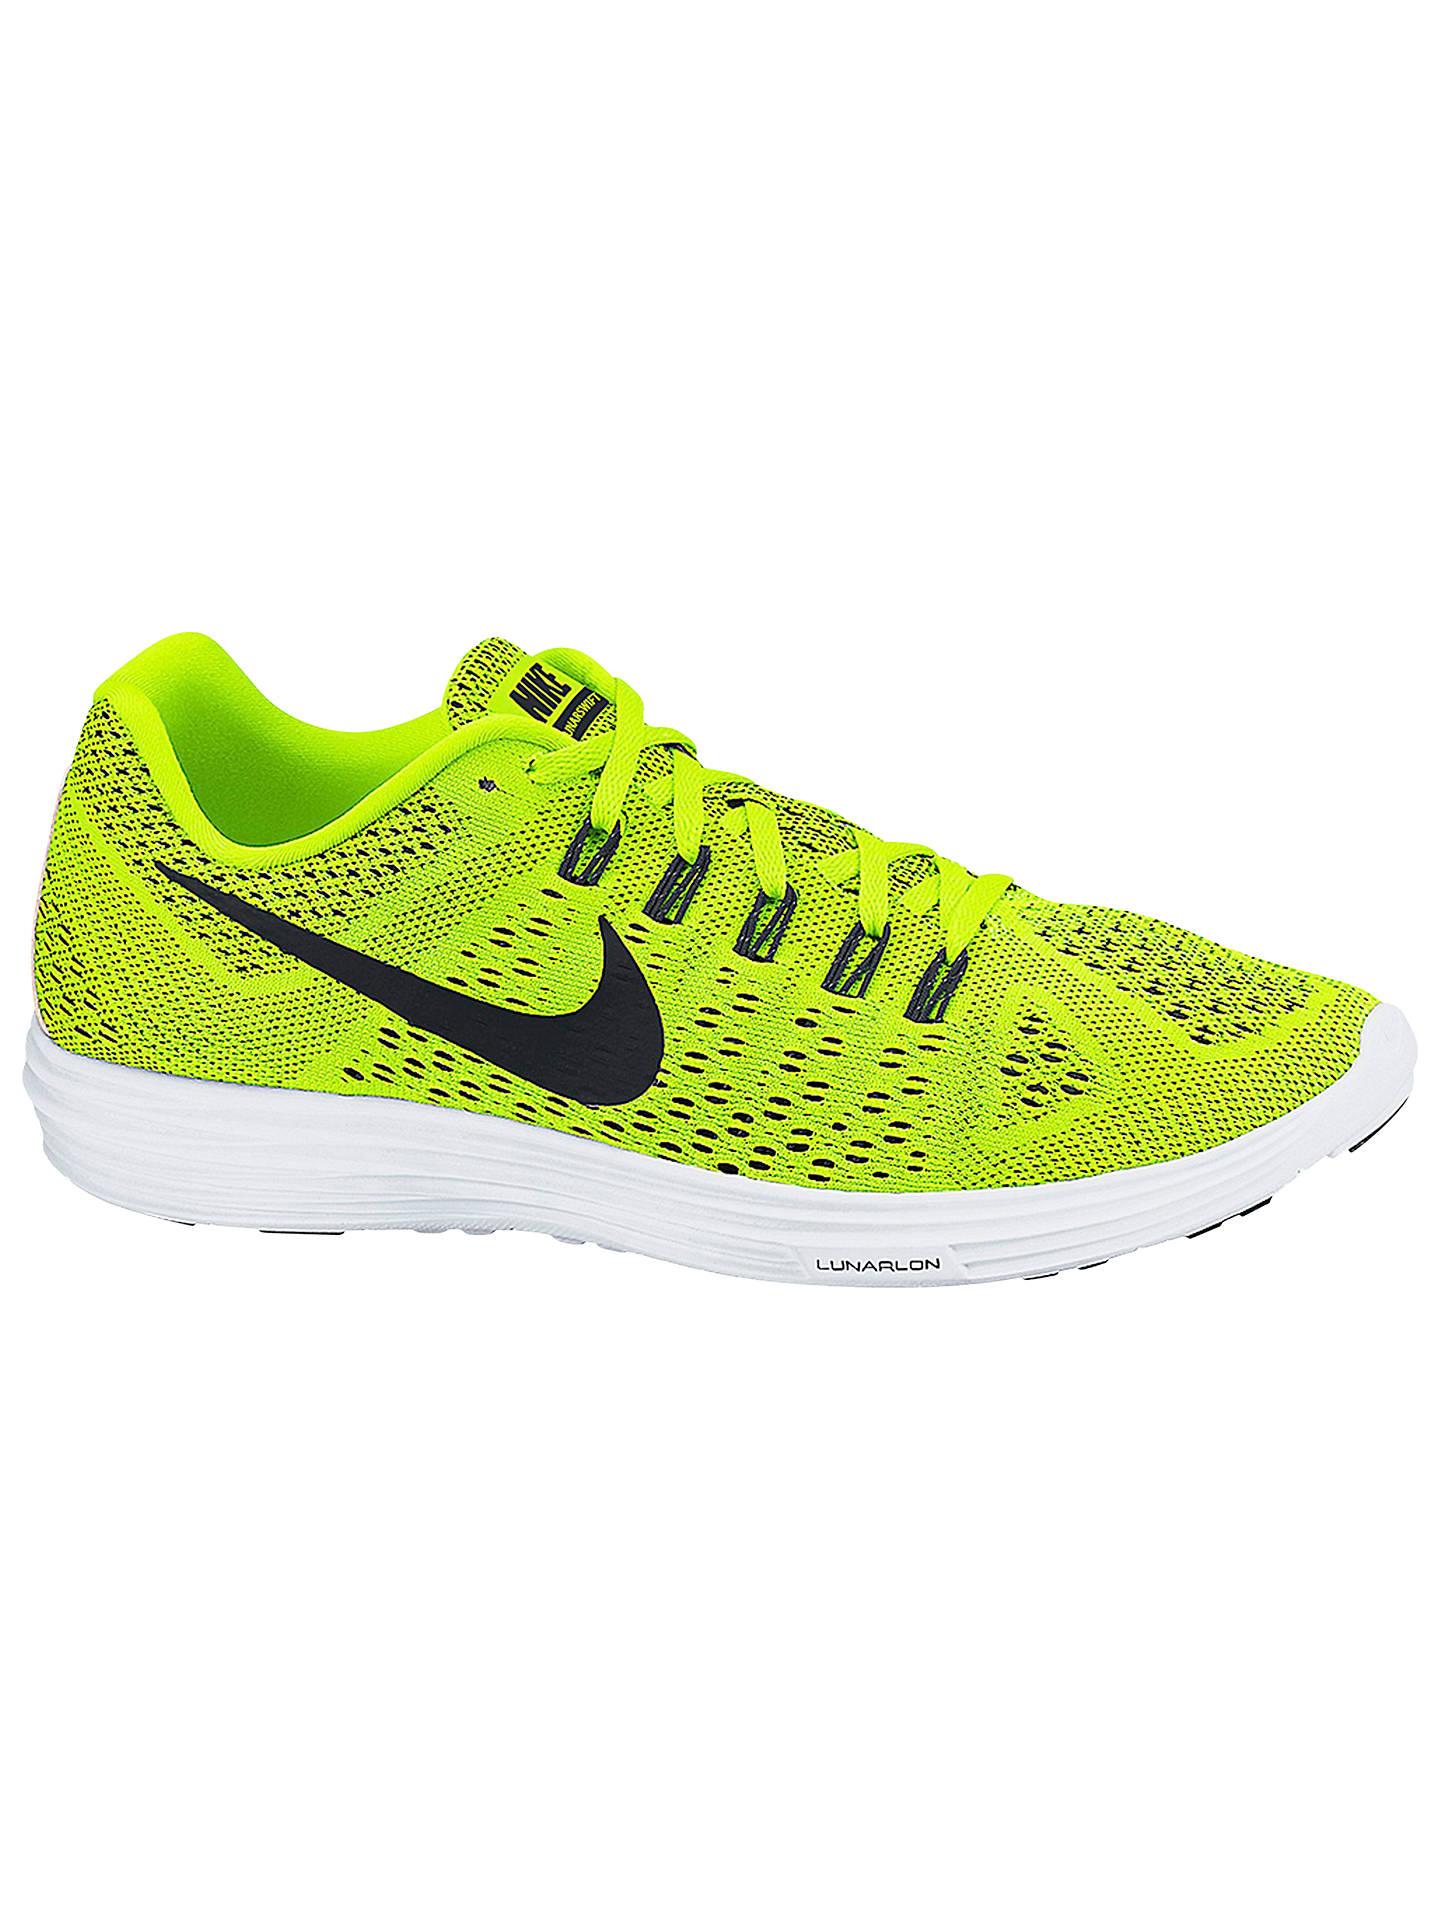 37f9d6a0ba2bb BuyNike LunarTempo Men s Running Shoes